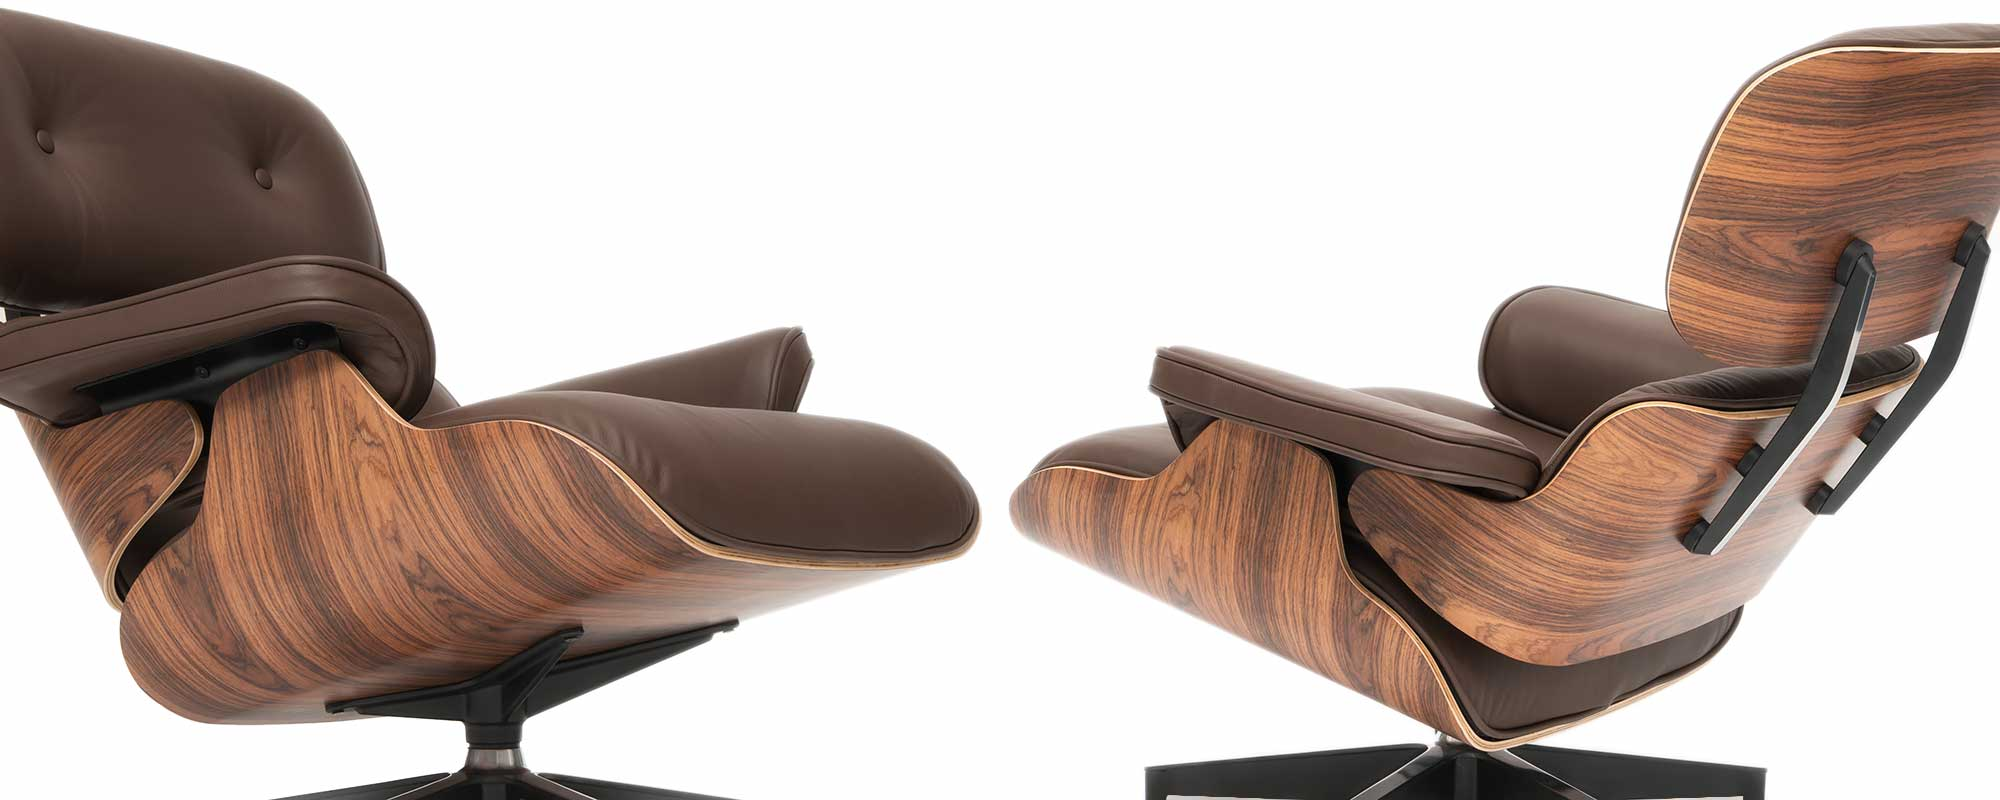 Butaca Eames Lounge Chair